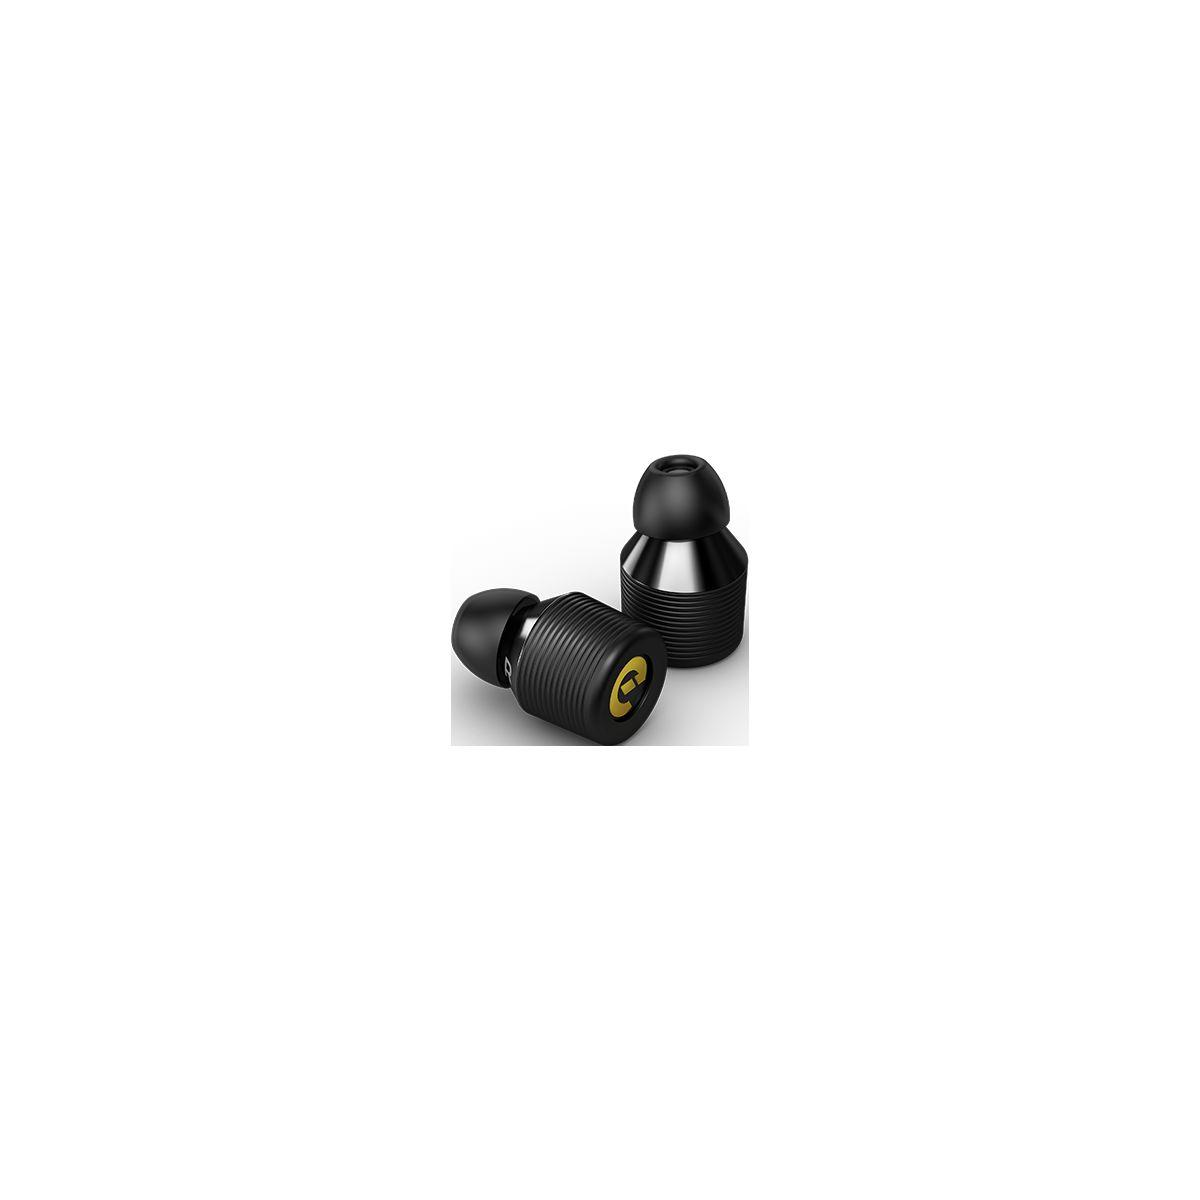 Ecouteurs intra earin bluetooth earbuds m-1 alu - livraison of...